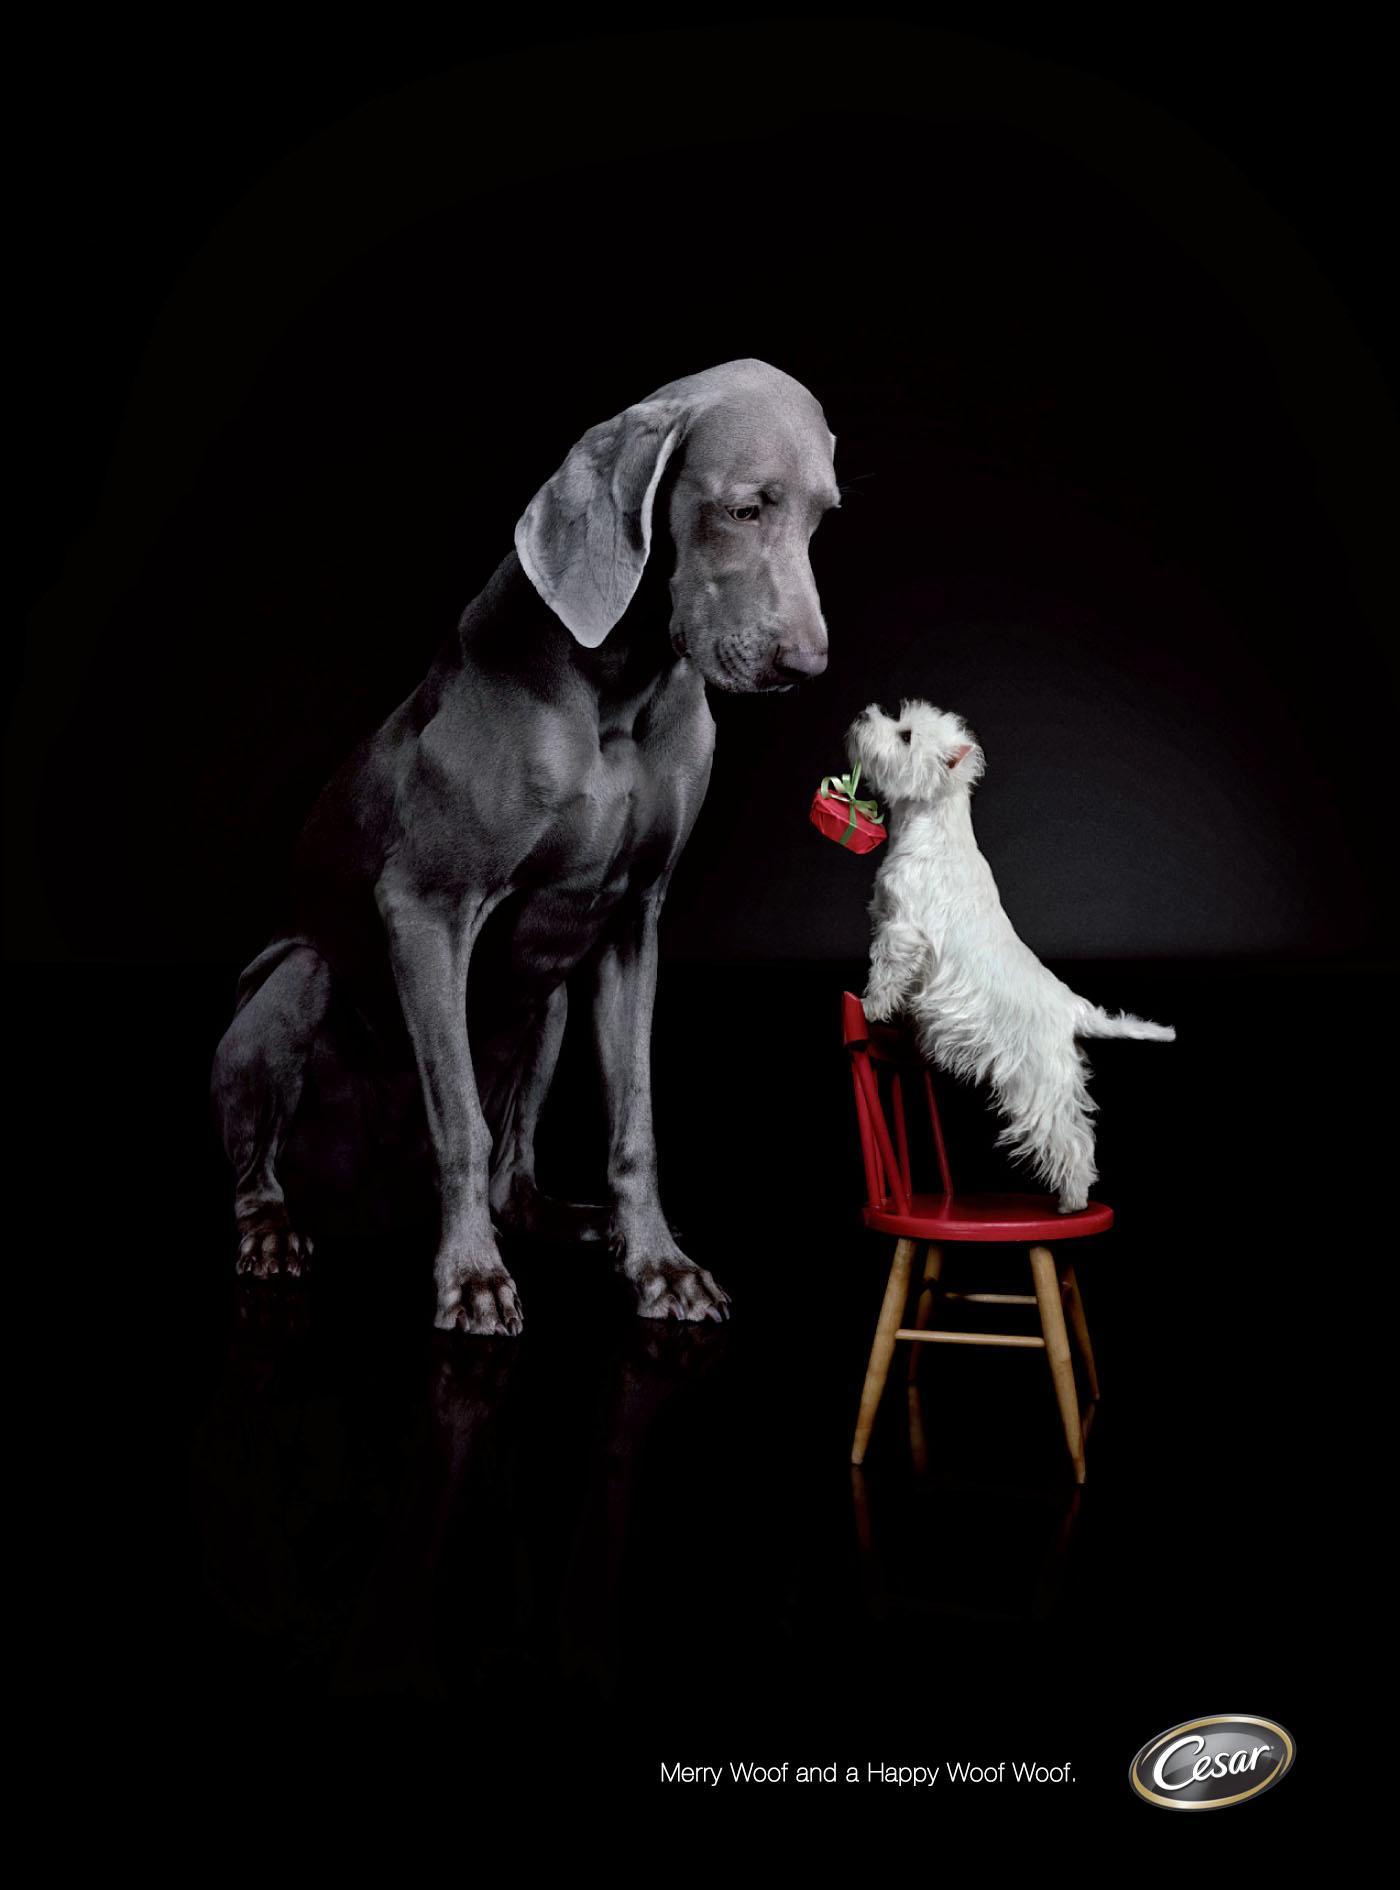 Cesar Print Ad -  Merry Woof